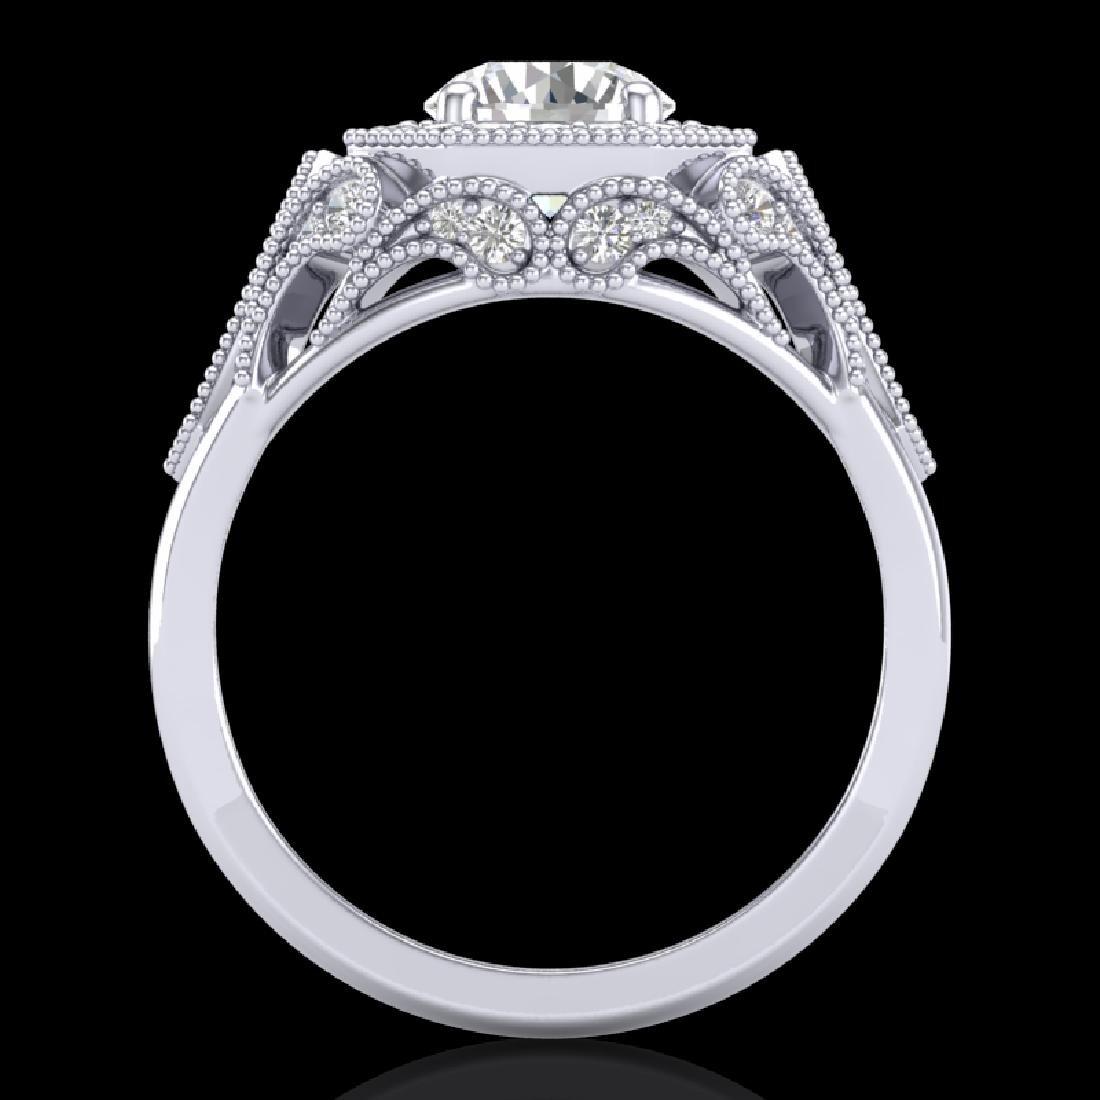 1.75 CTW VS/SI Diamond Solitaire Art Deco Ring 18K